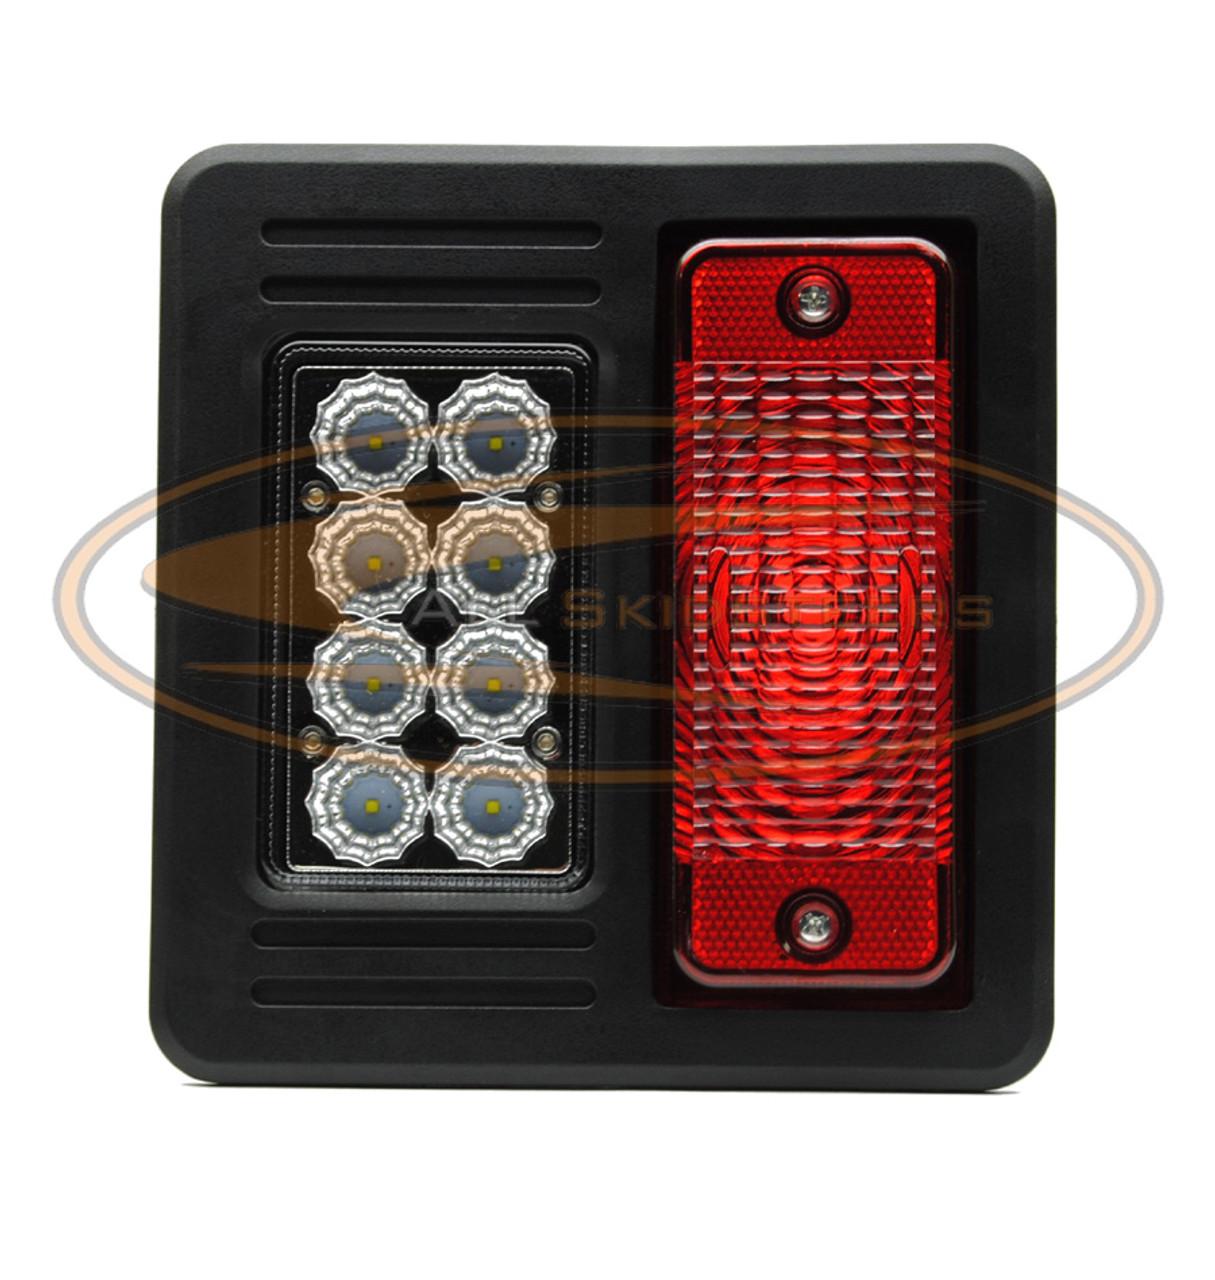 Bobcat Led Tail Light Assembly Replaces Oem 6670284 Plug Play